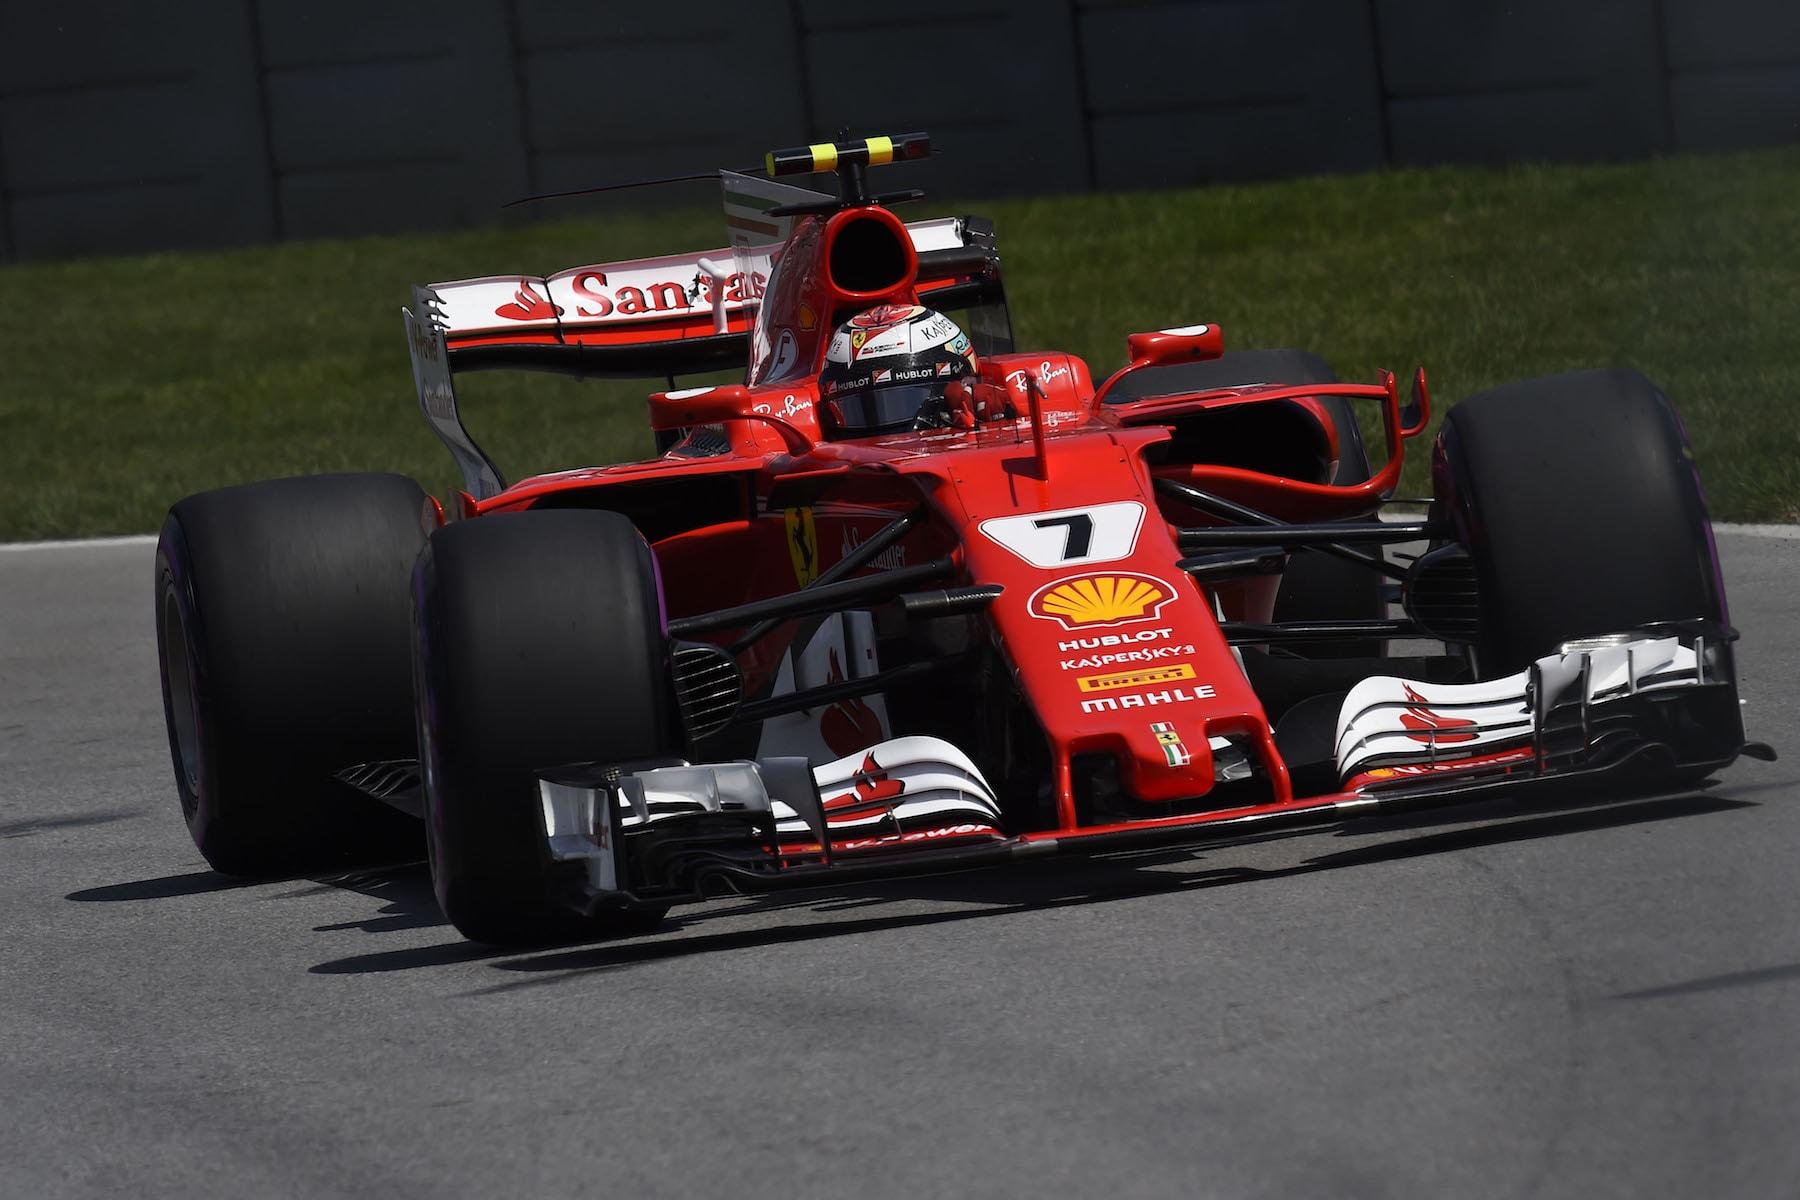 H 2017 Kimi Raikkonen | Ferrari SF70H | 2017 Canadian GP P7 1 copy.jpg